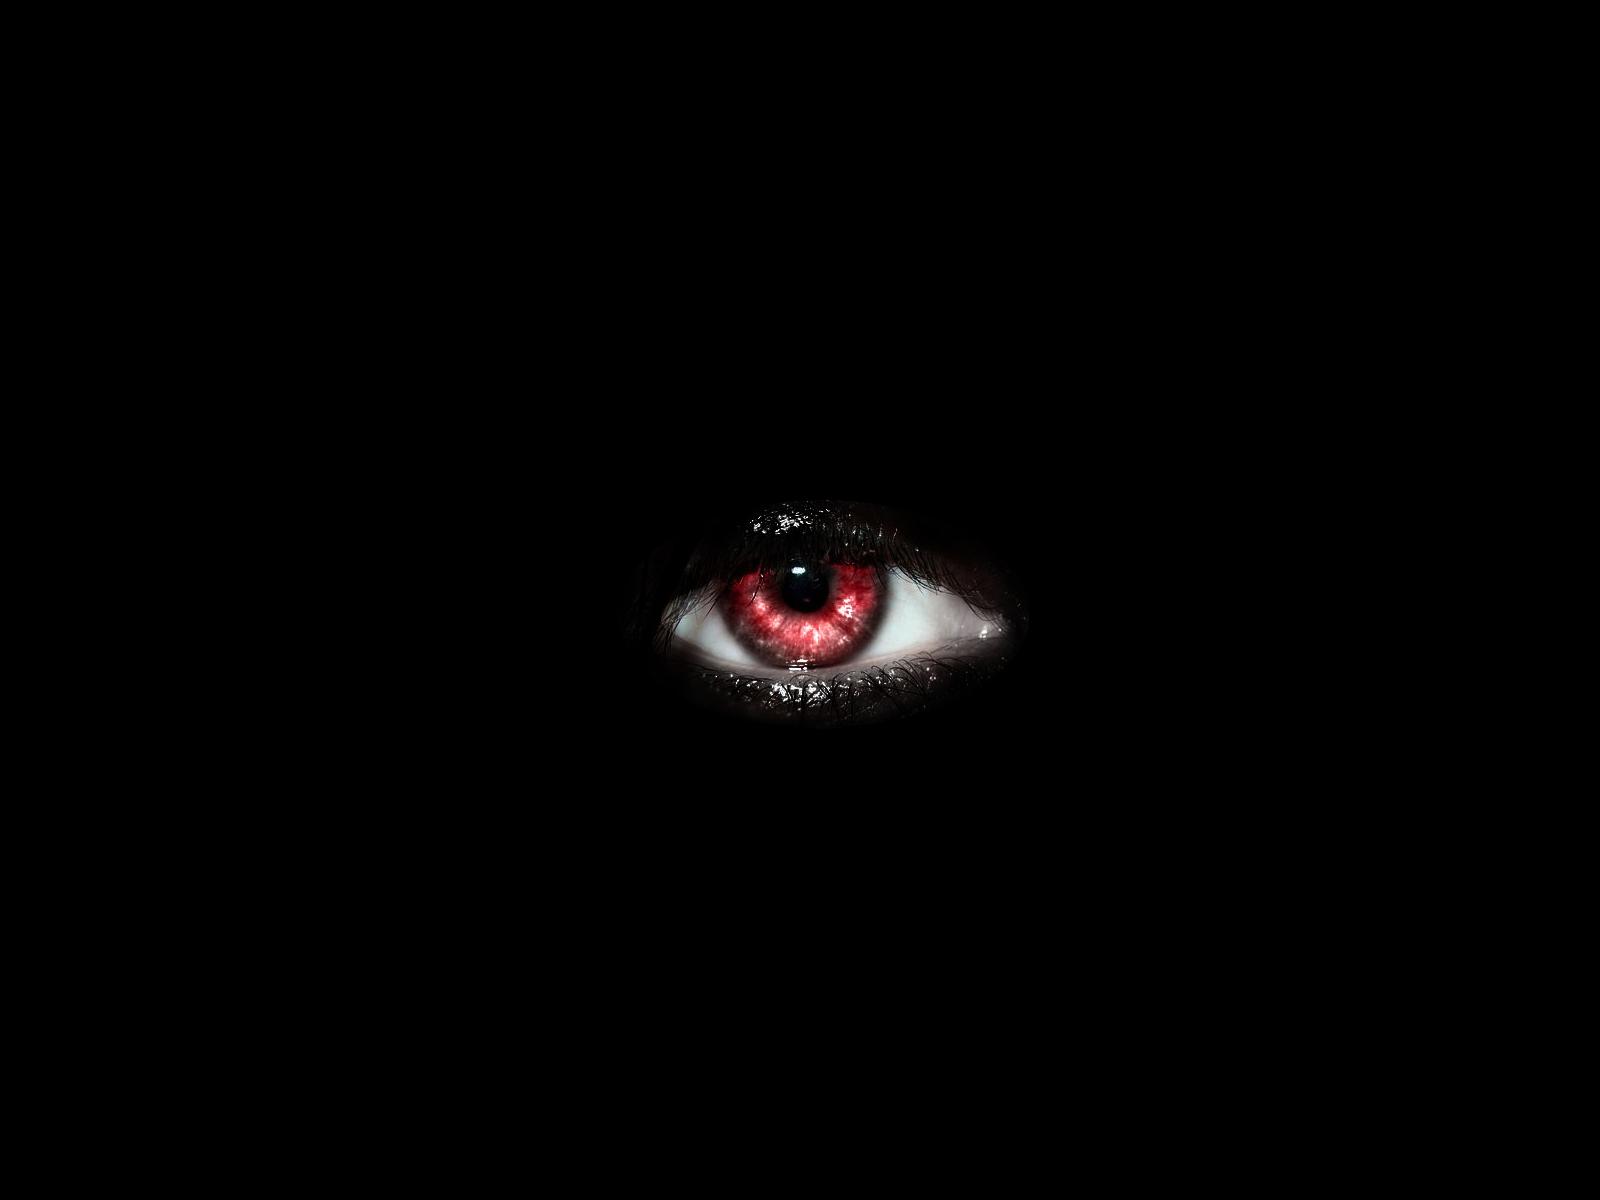 the eye wallpaper #18